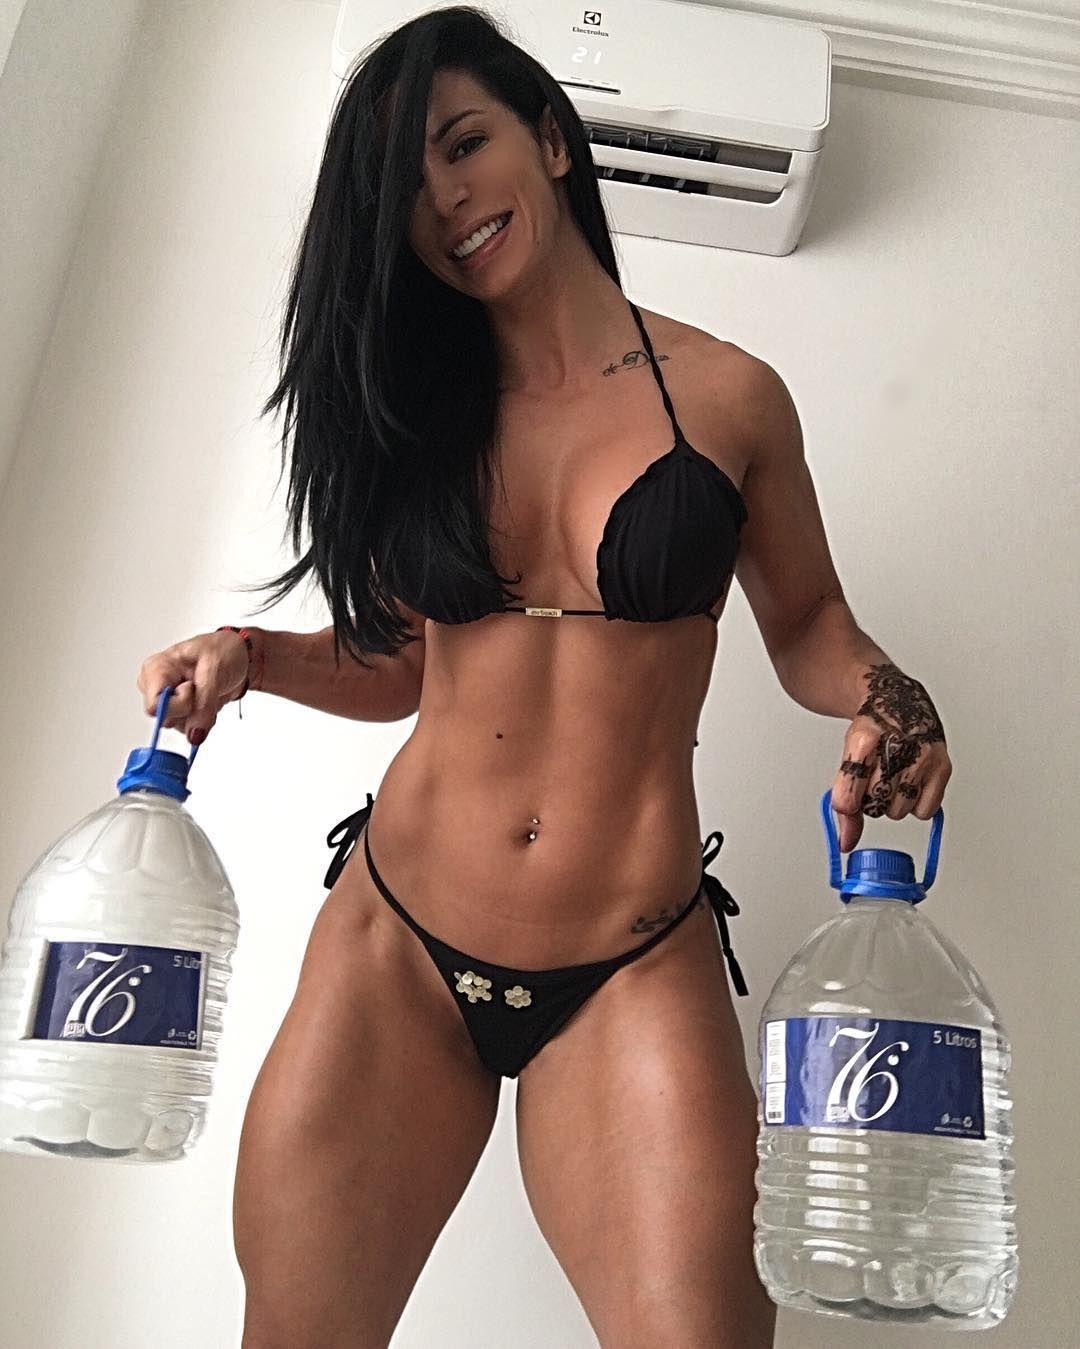 Ana Cozar Nude download sex pics ana cozar ifbb espana927 instagram photos